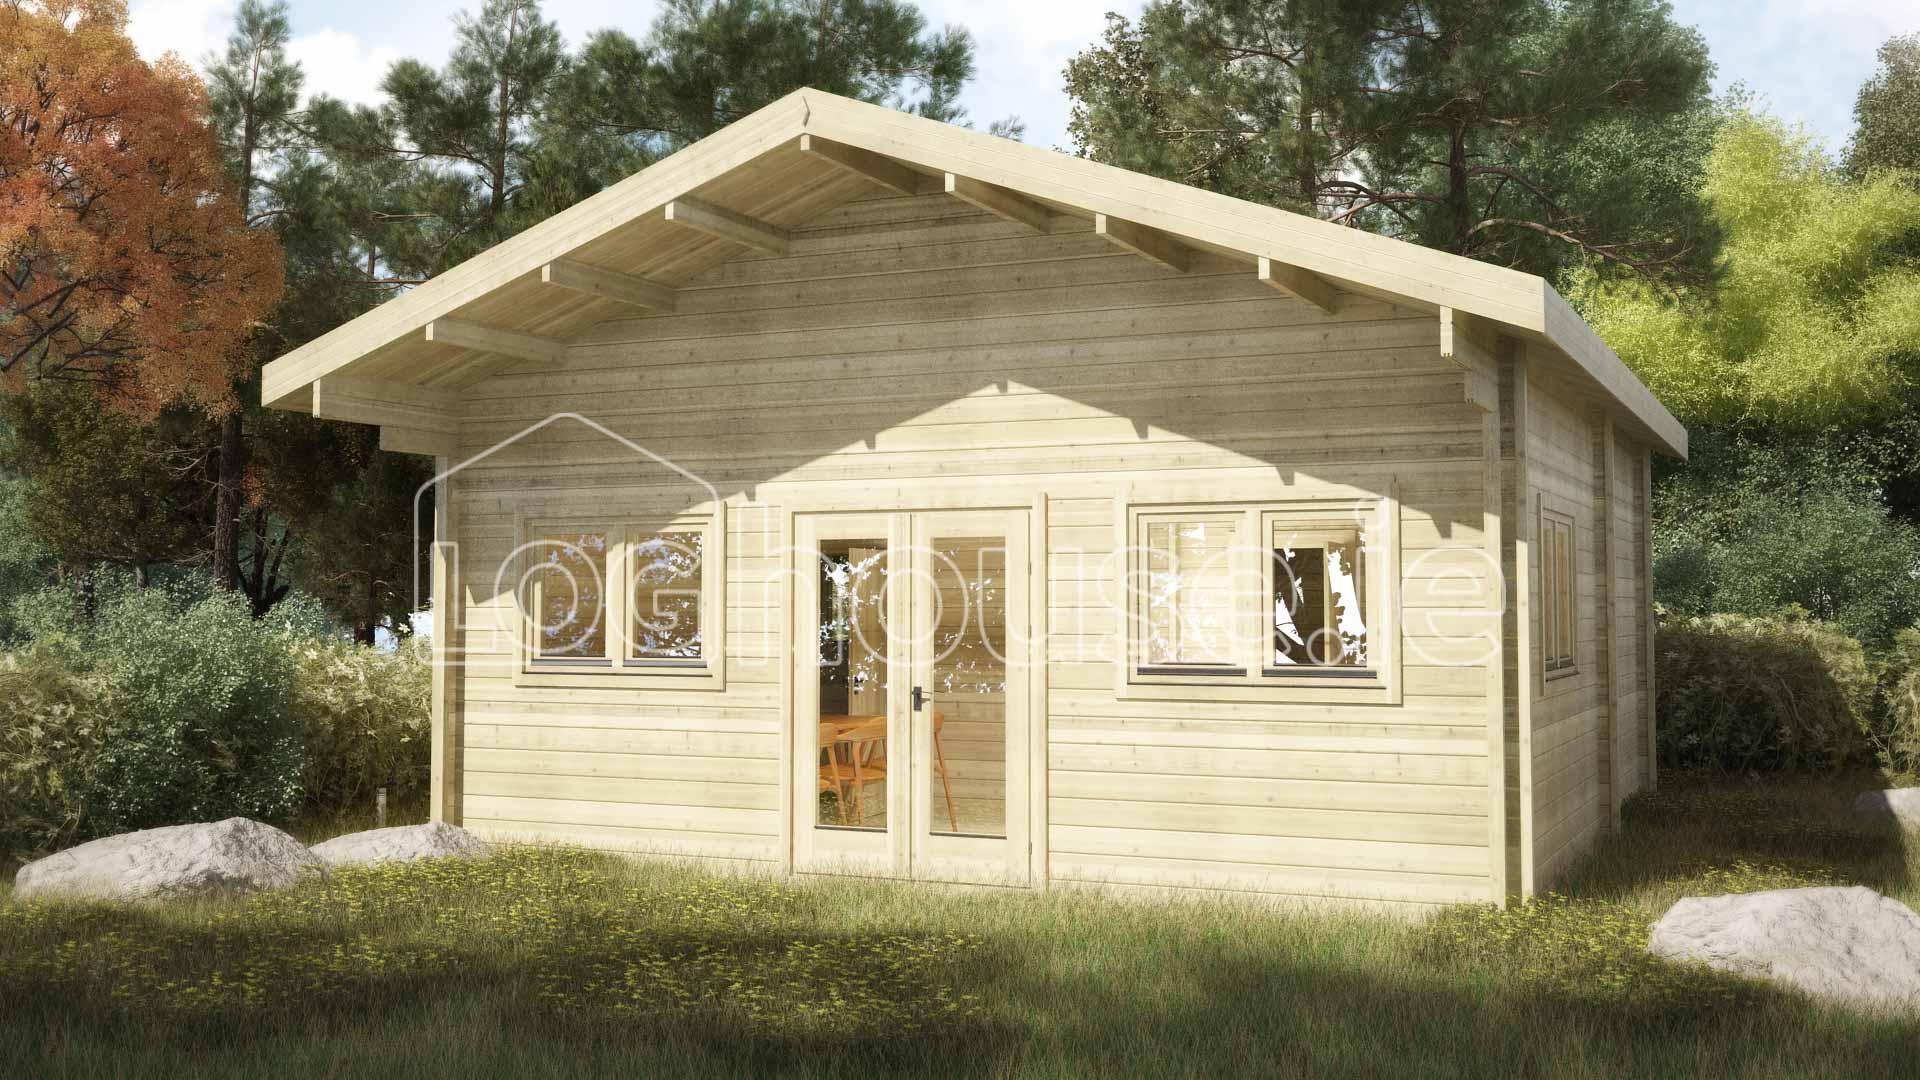 Loft log cabin b 6m x 6m for Loft cabins for sale